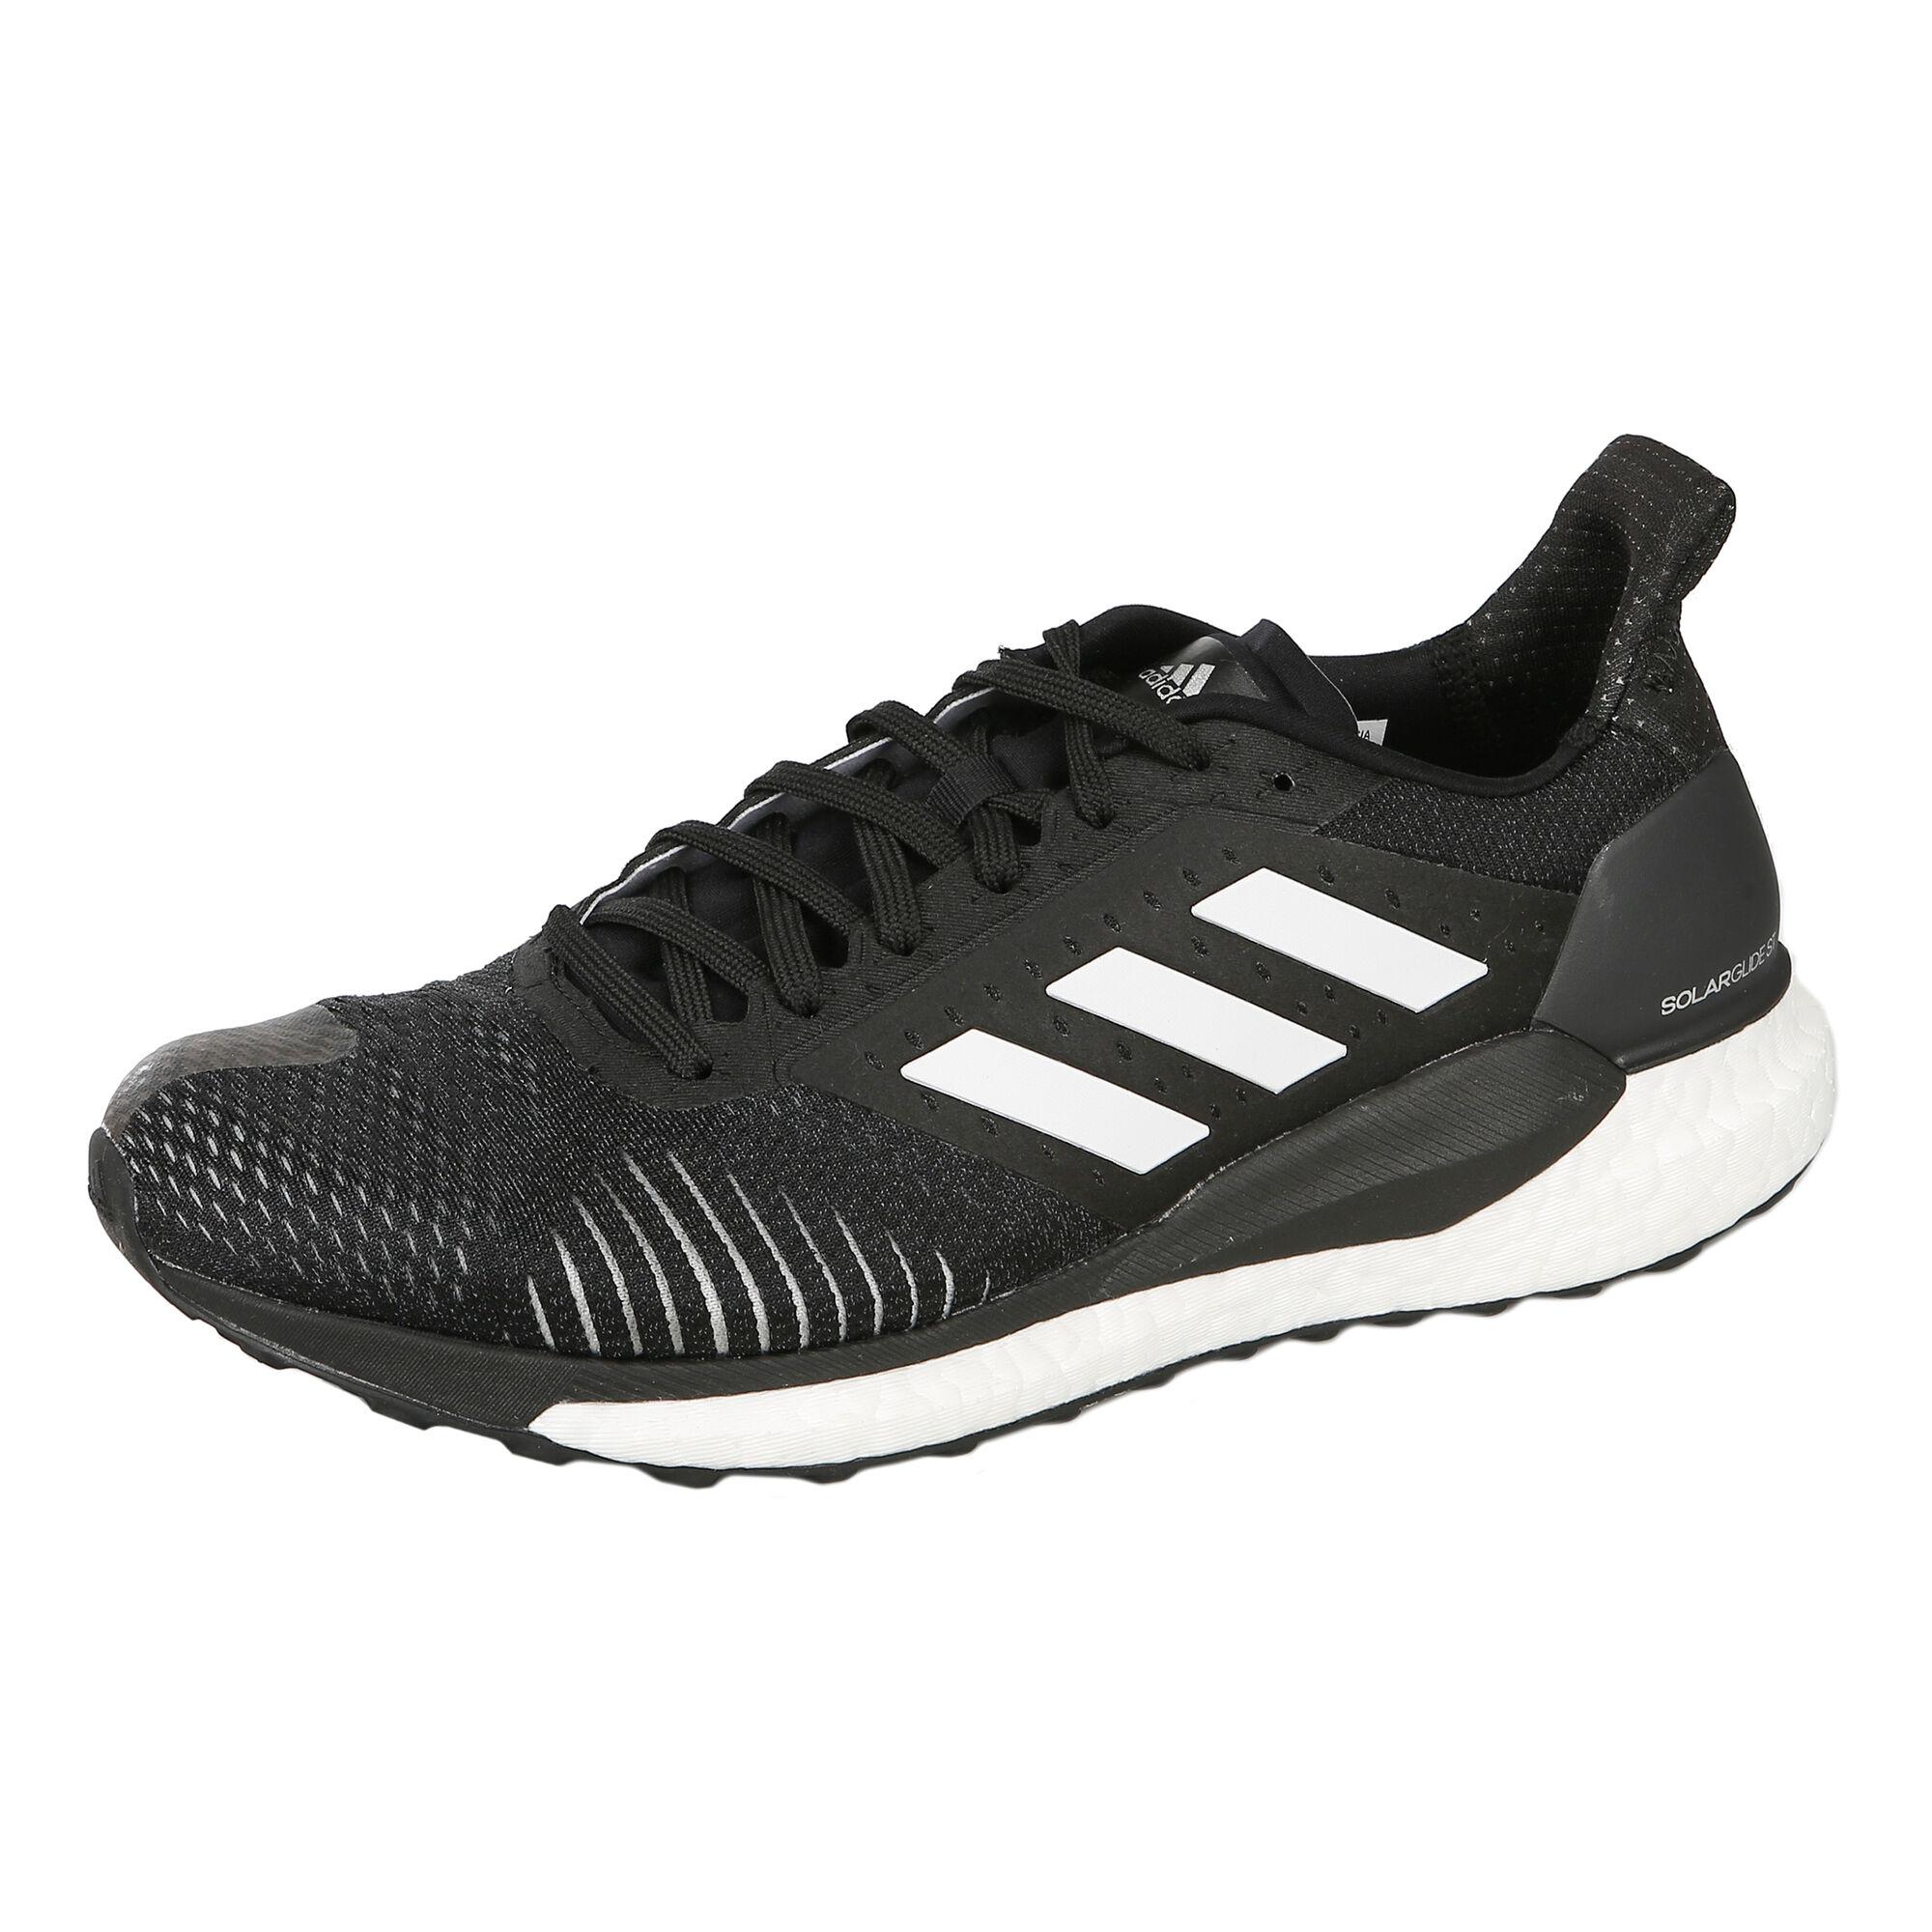 reputable site 5e630 95a88 adidas · adidas · adidas · adidas. Solar Glide ...